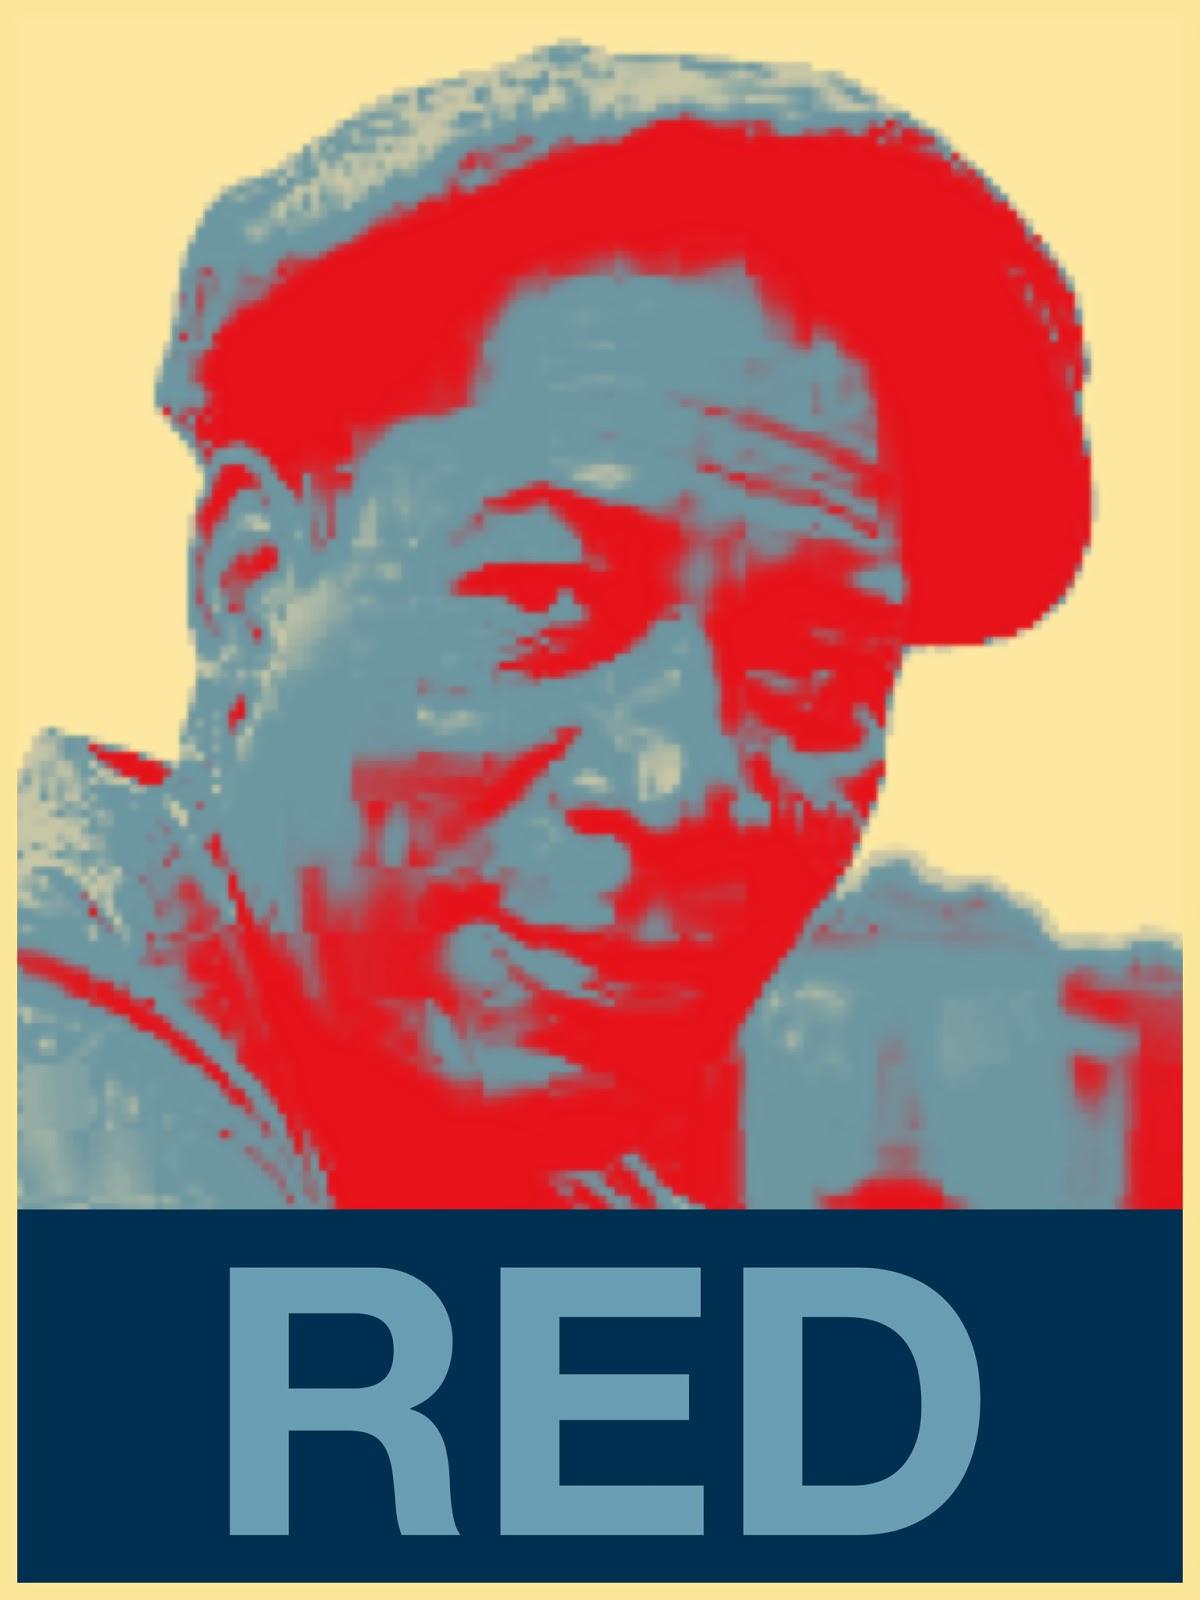 Red Cadena Perpetua